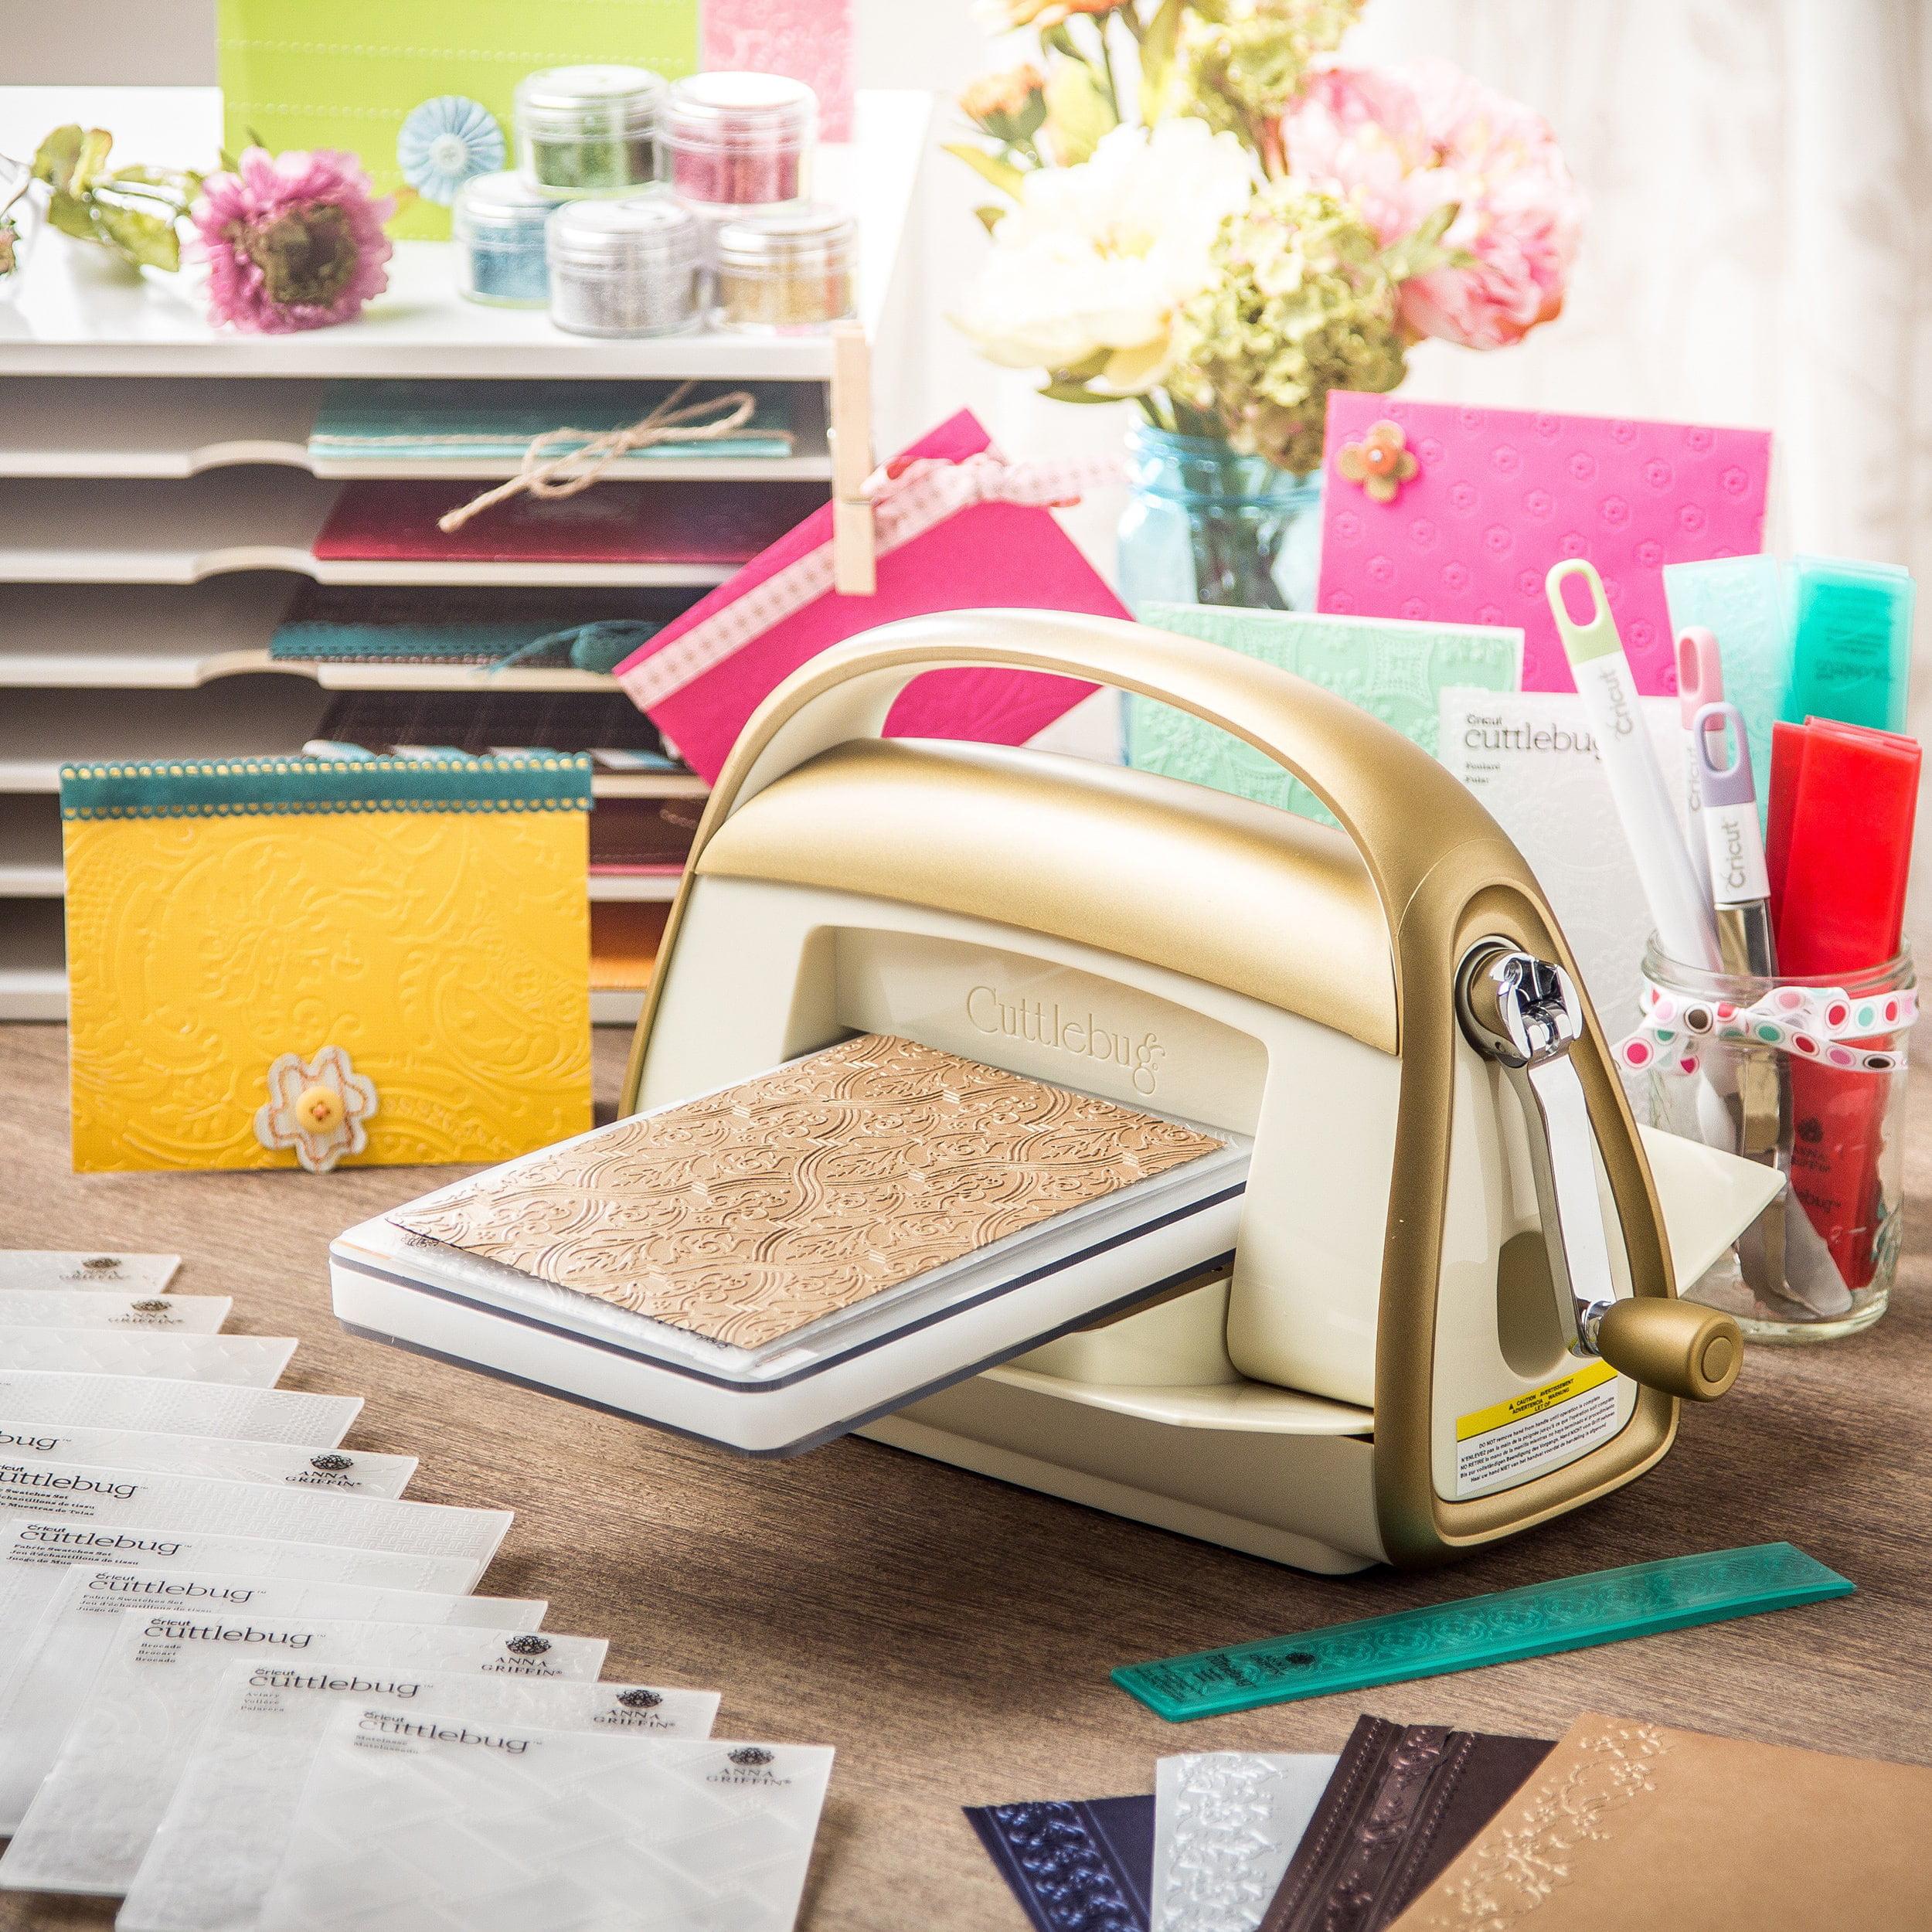 Cricut Anna Griffin Cuttlebug Machine With 14 Bonus Folders Com